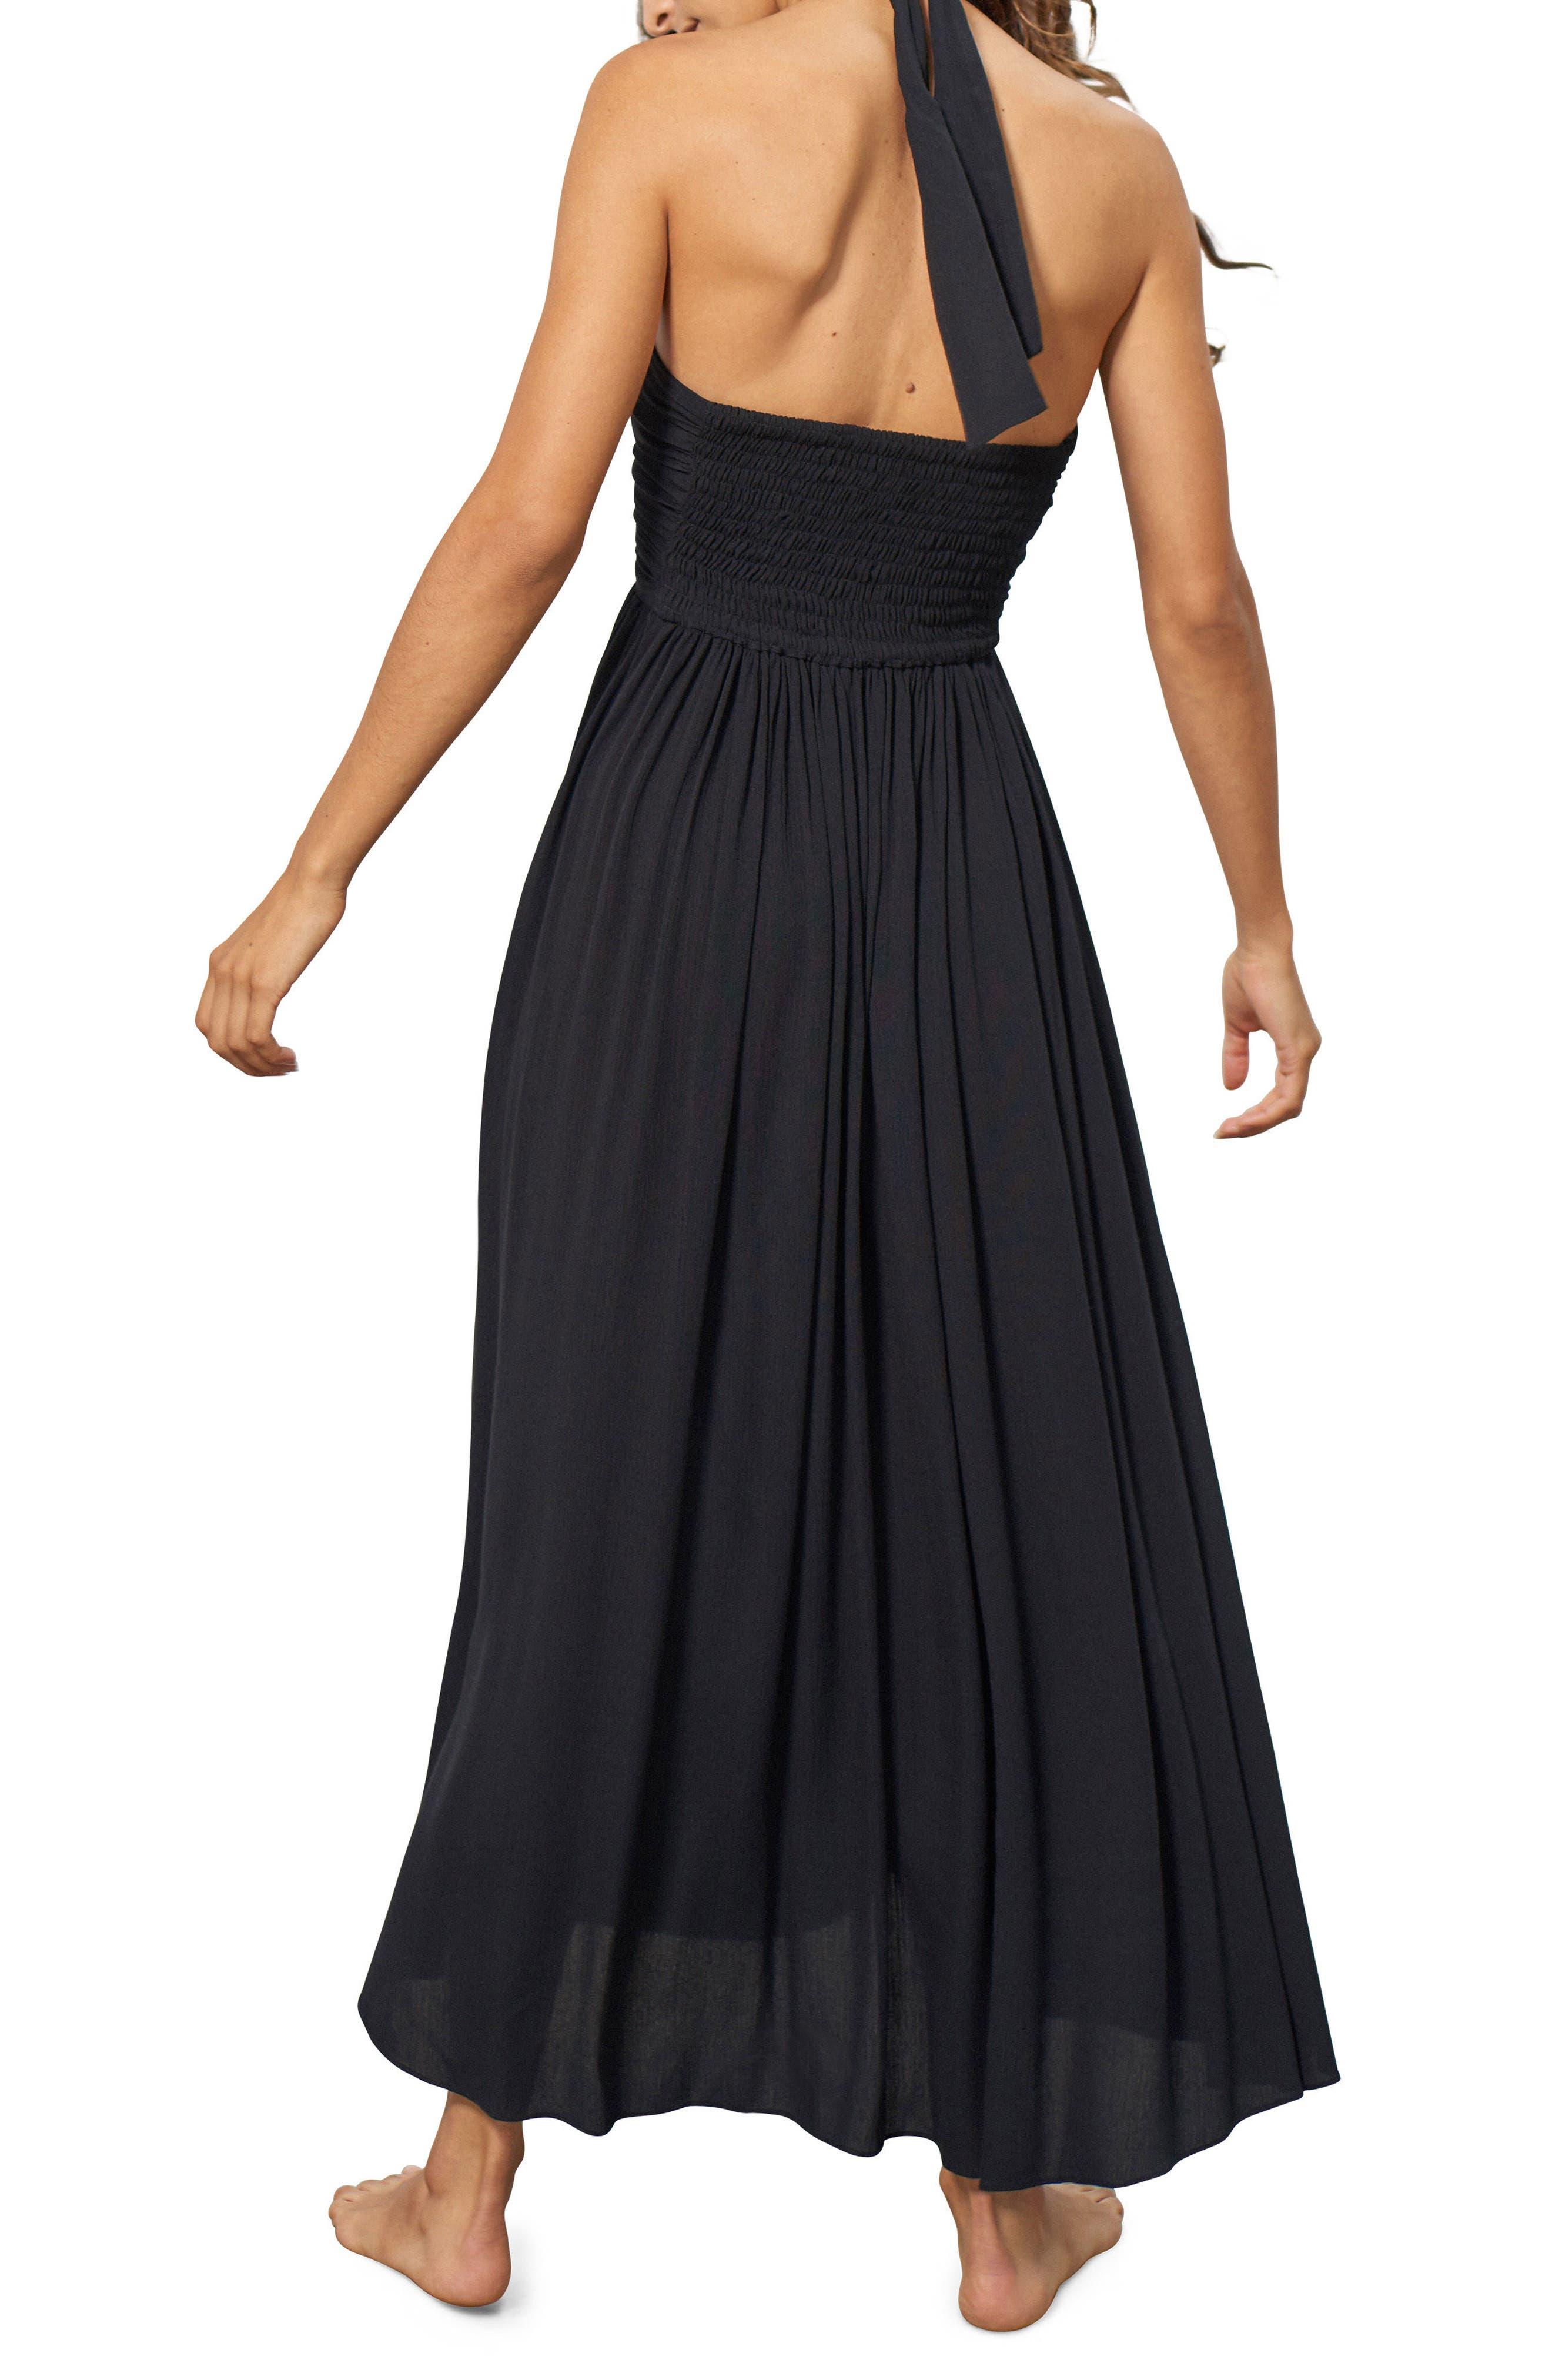 MARA HOFFMAN,                             Annika Cover-Up Dress,                             Alternate thumbnail 2, color,                             001